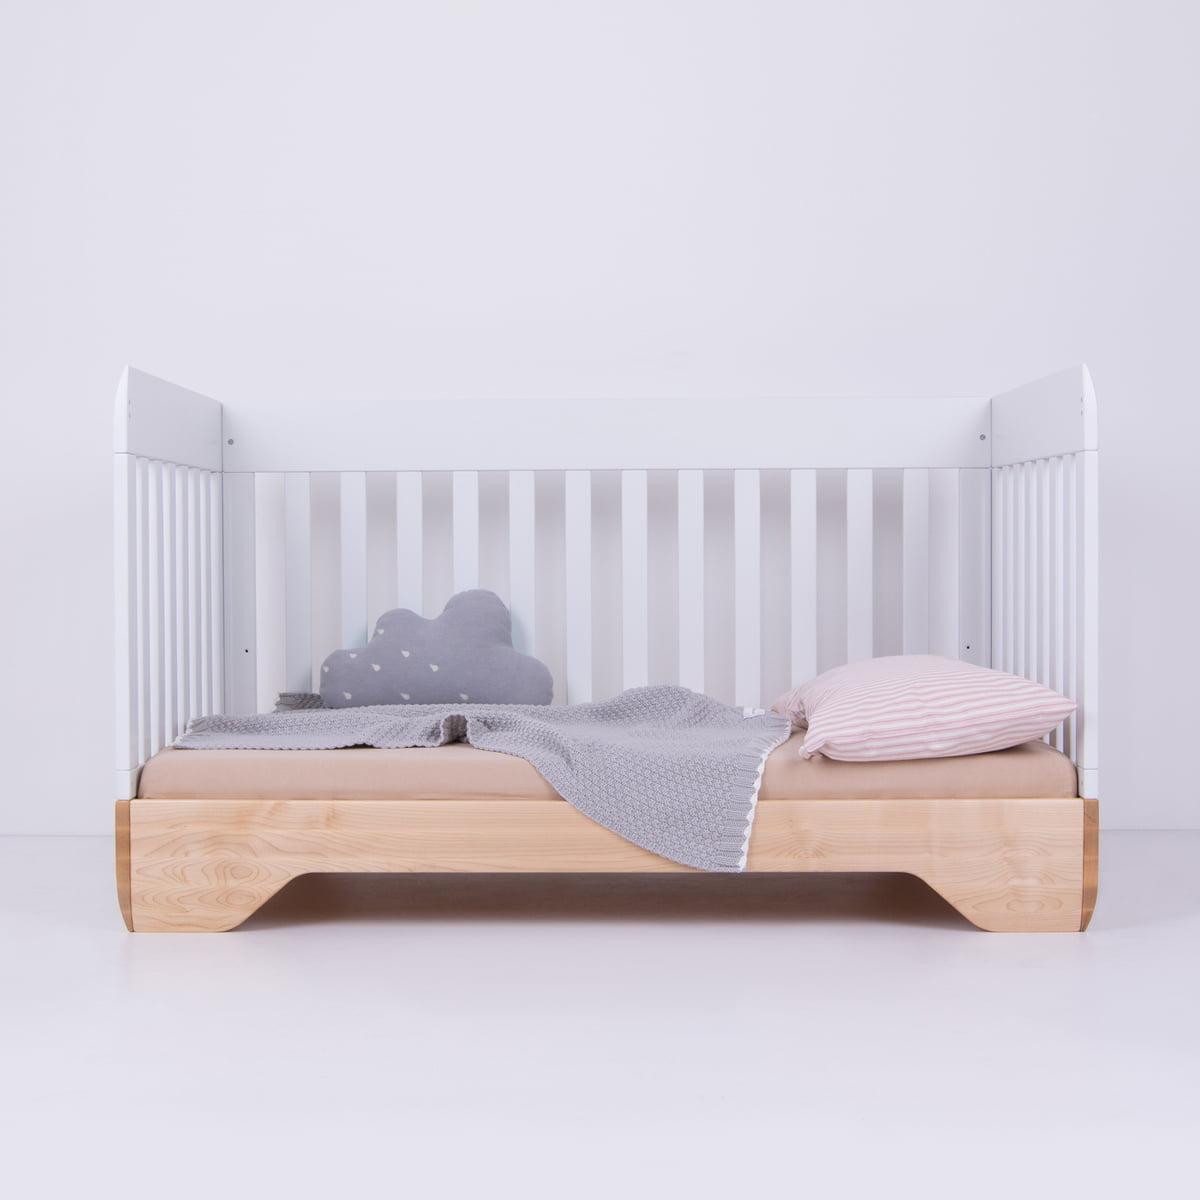 lit b b et enfant echo de kalon. Black Bedroom Furniture Sets. Home Design Ideas